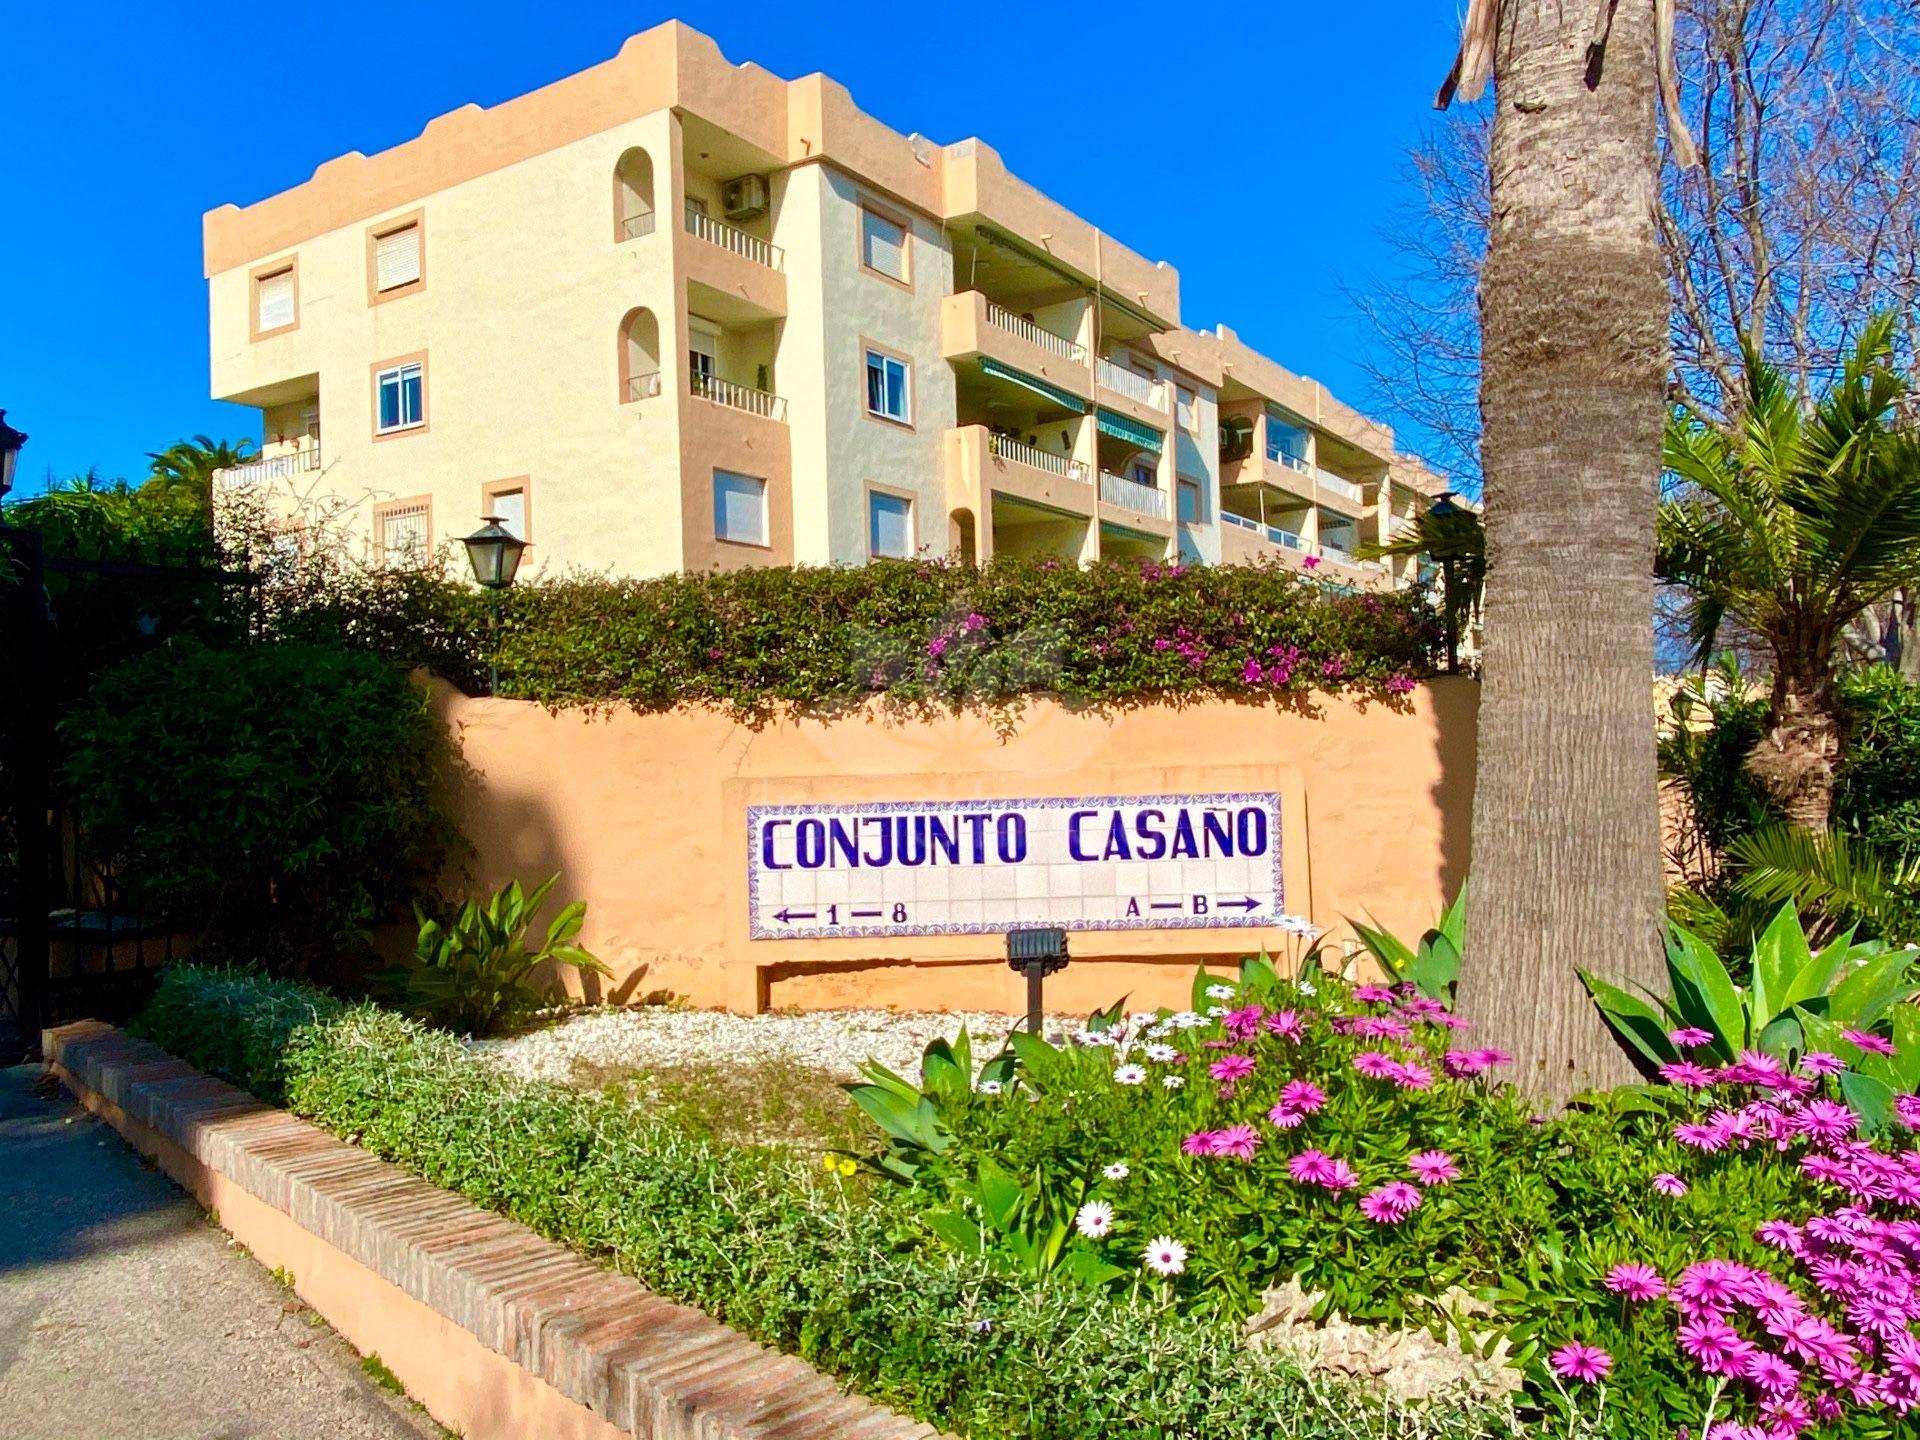 Apartment in Conjunto Casaño, Marbella